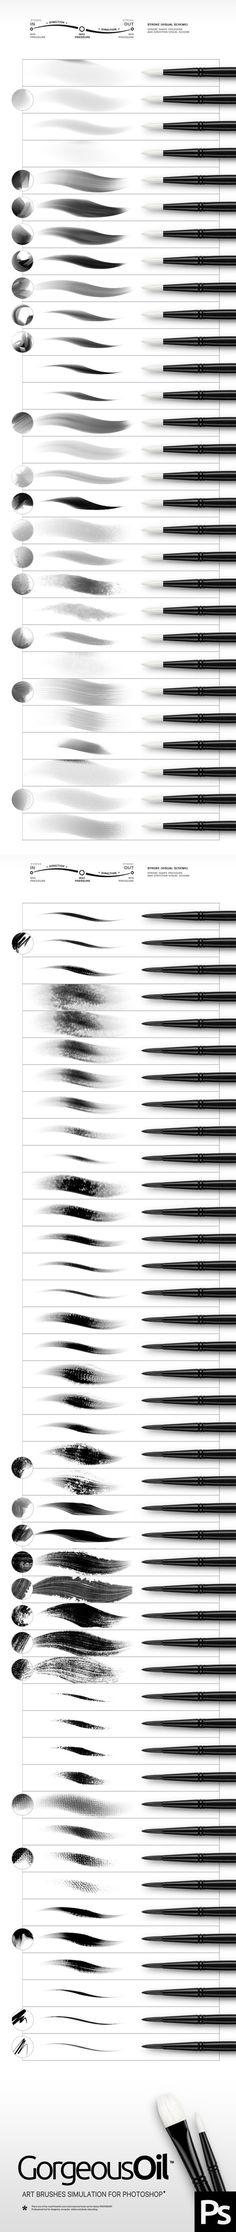 Oil Photoshop Brushes. Download here: http://graphicriver.net/item/oil-brushes/15815729?ref=ksioks